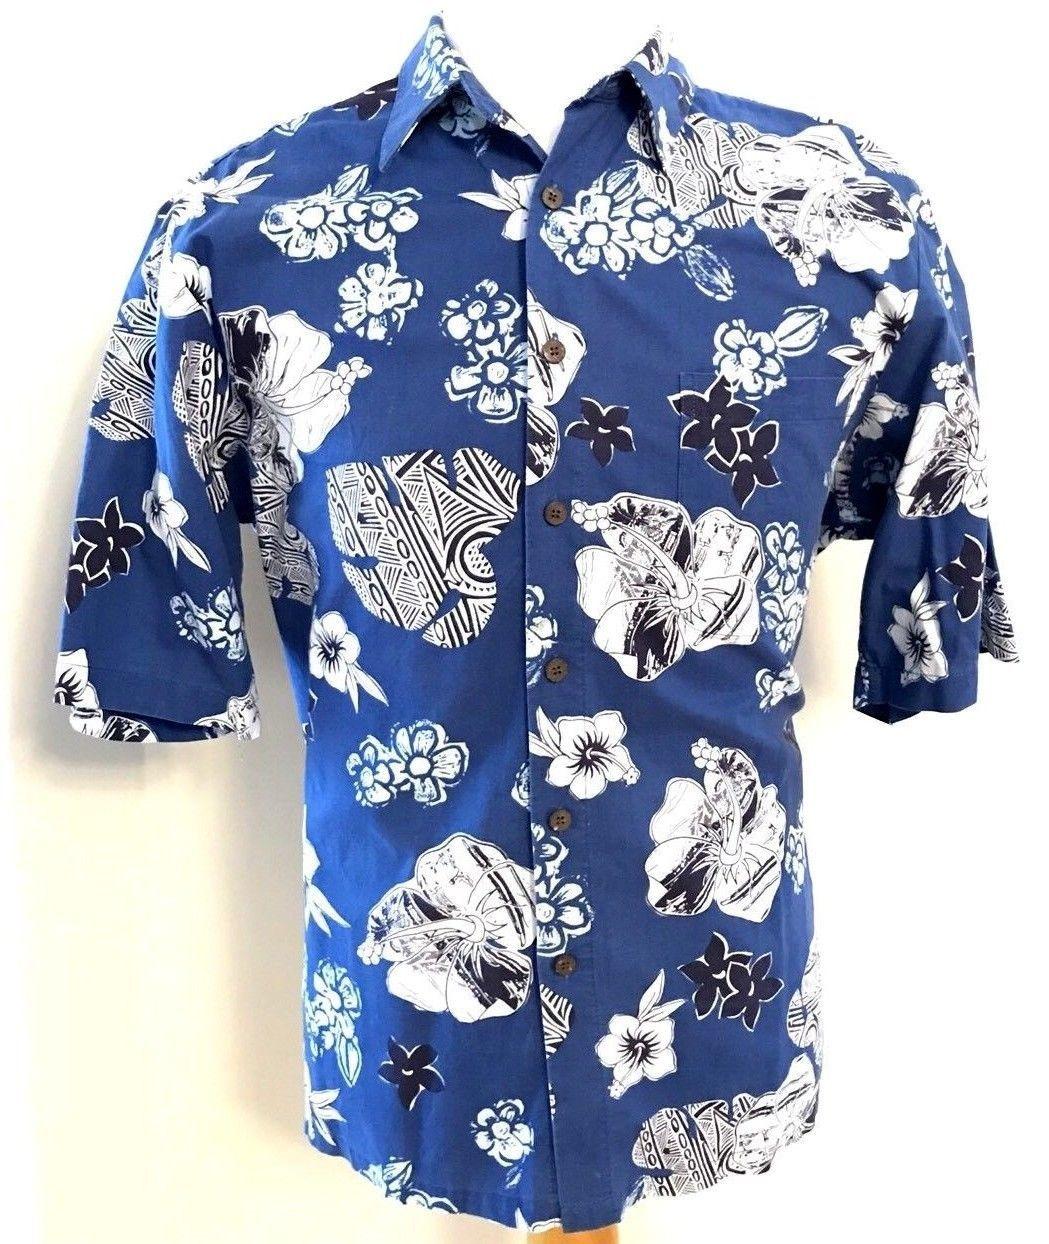 f37f75339 S l1600. S l1600. Previous. Reyn Spooner Shirt Large L Blue Floral Print  Short Sleeve Shirt Hawaiian